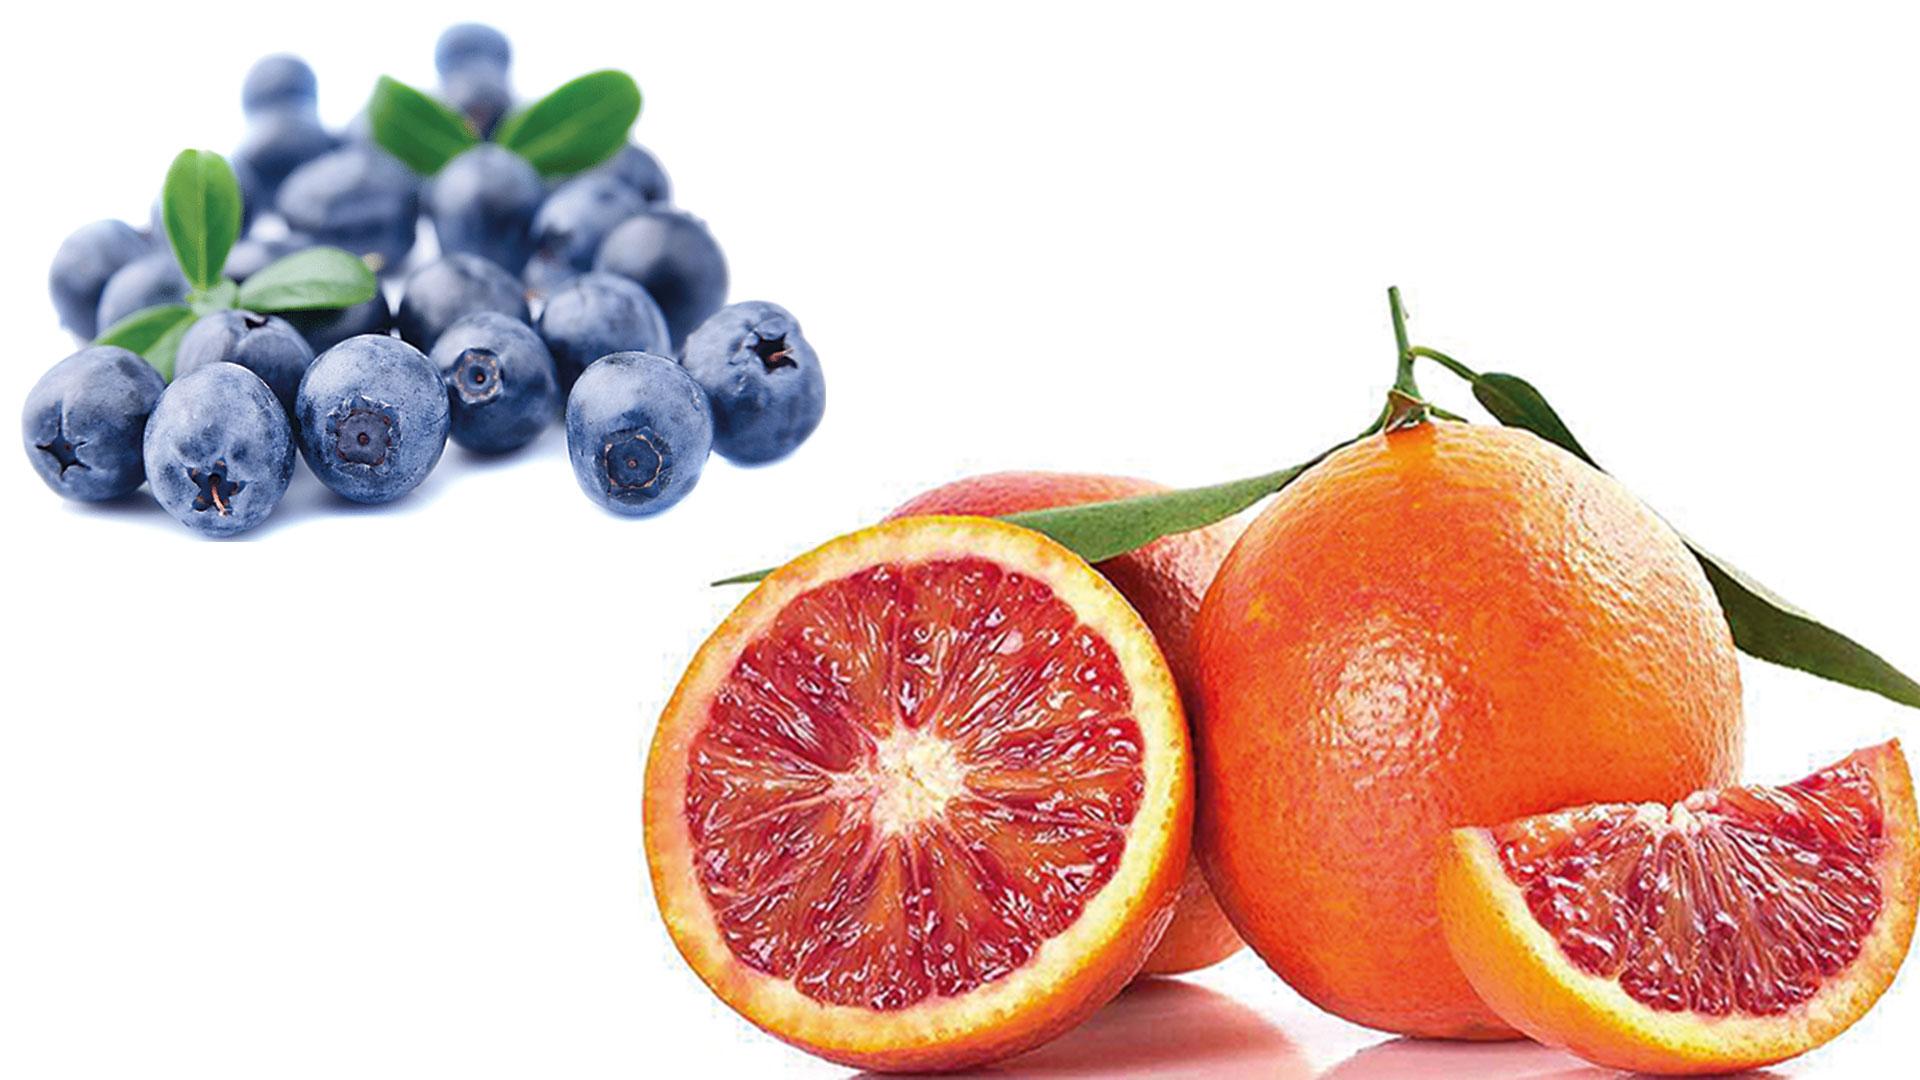 Arándanos y naranja sanguina.